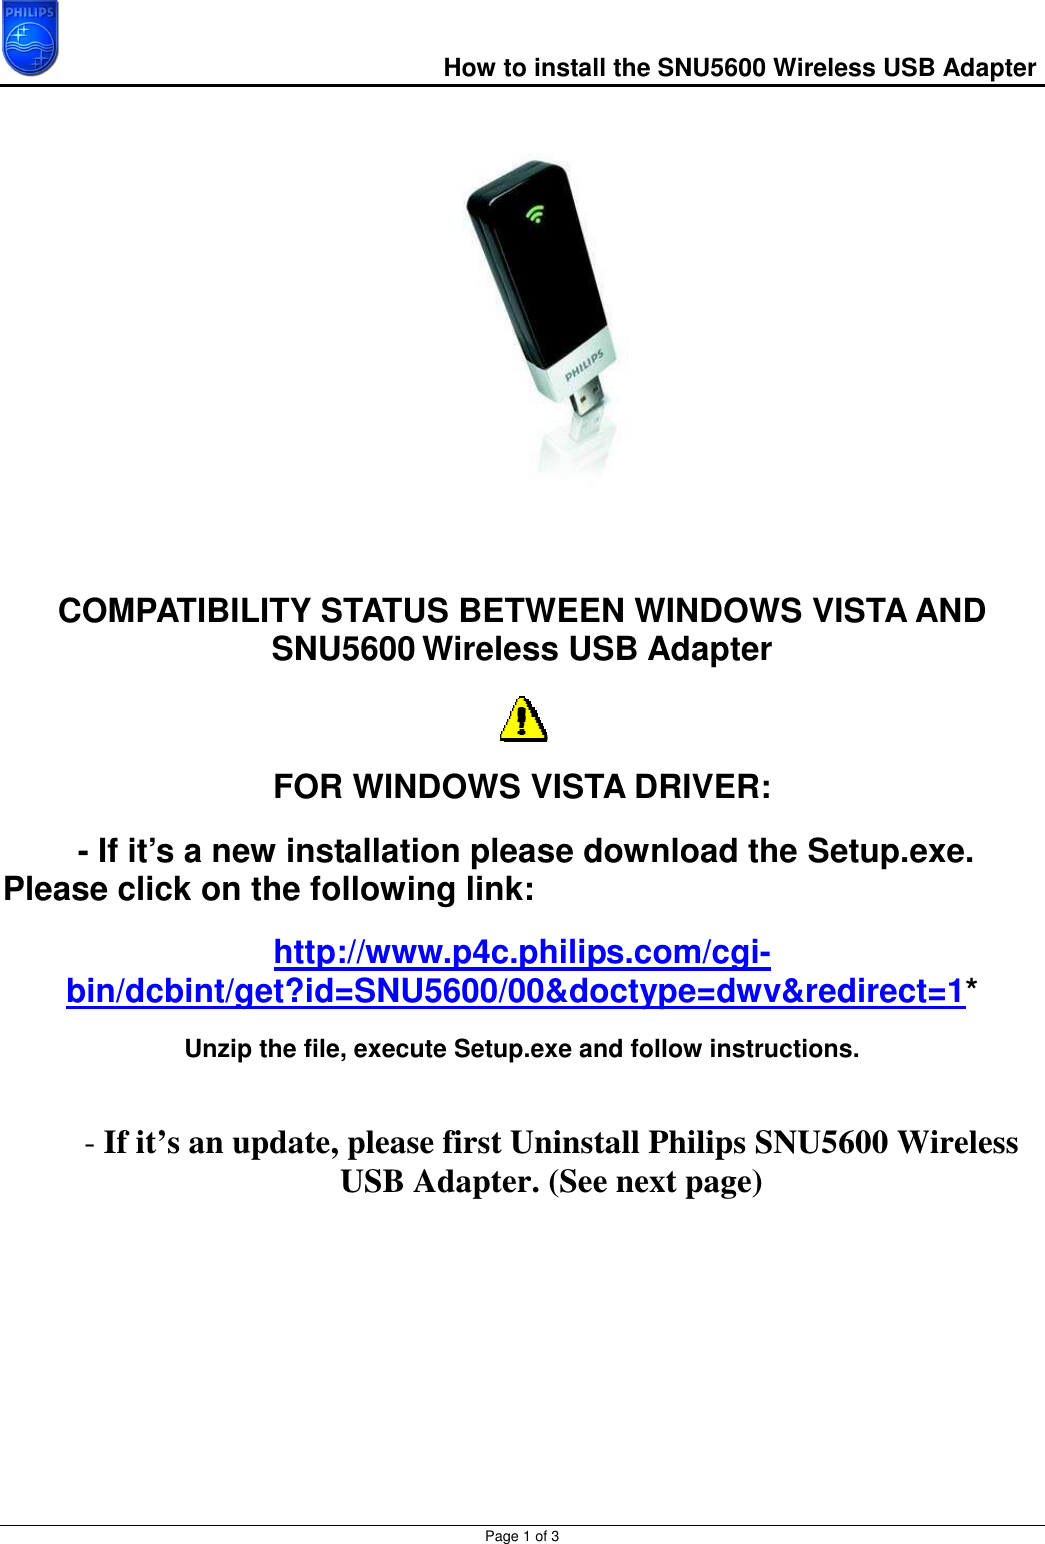 windows vista user guide daily instruction manual guides u2022 rh testingwordpress co Wildgame Innovations Manuals Instruction Manual Clip Art